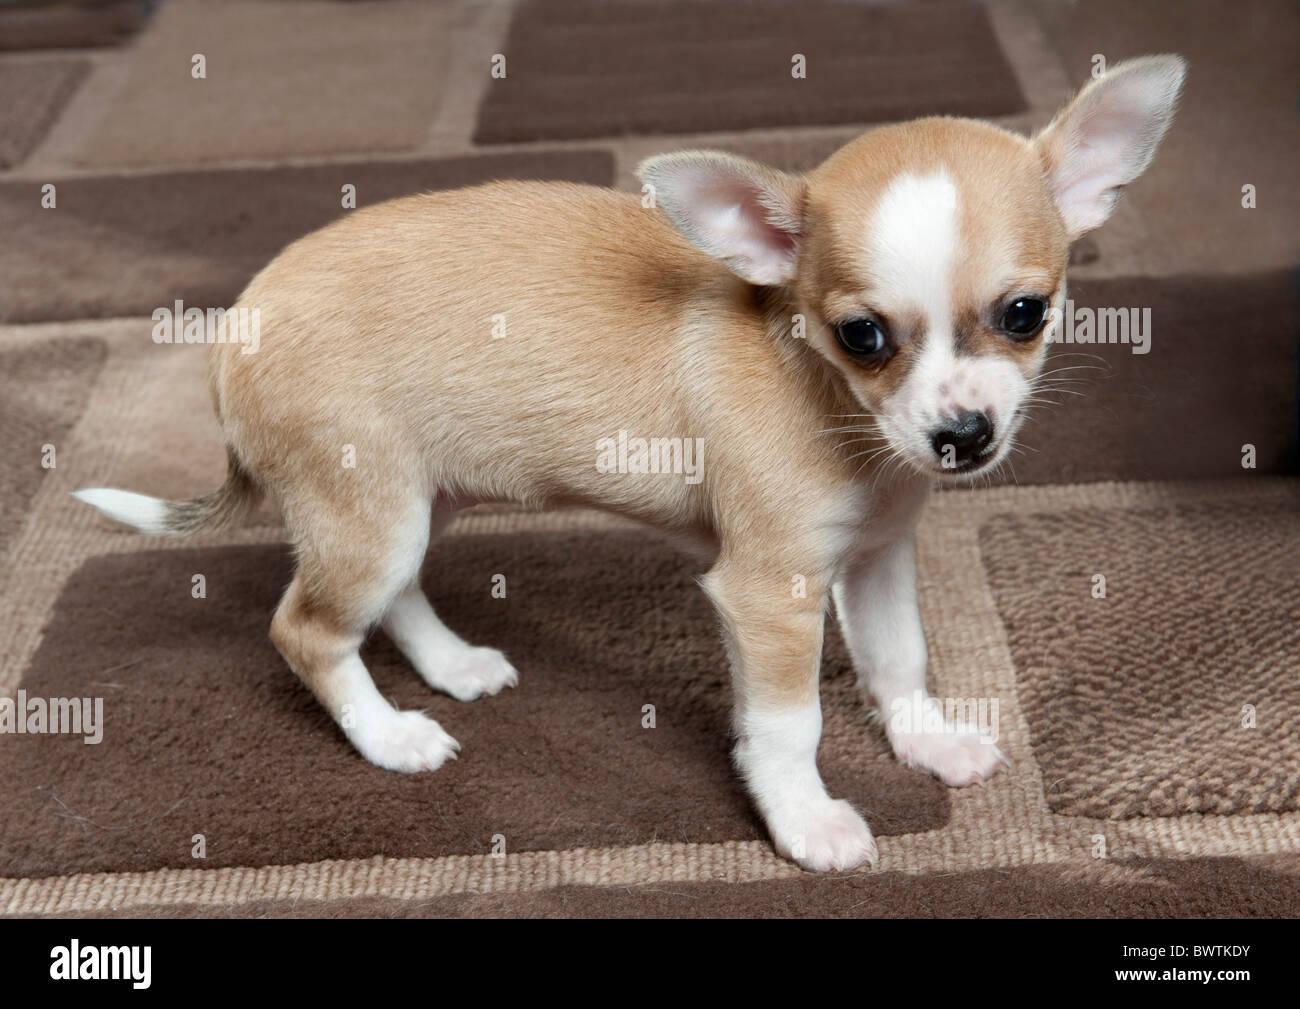 Chihuahua Dog Puppy UK - Stock Image